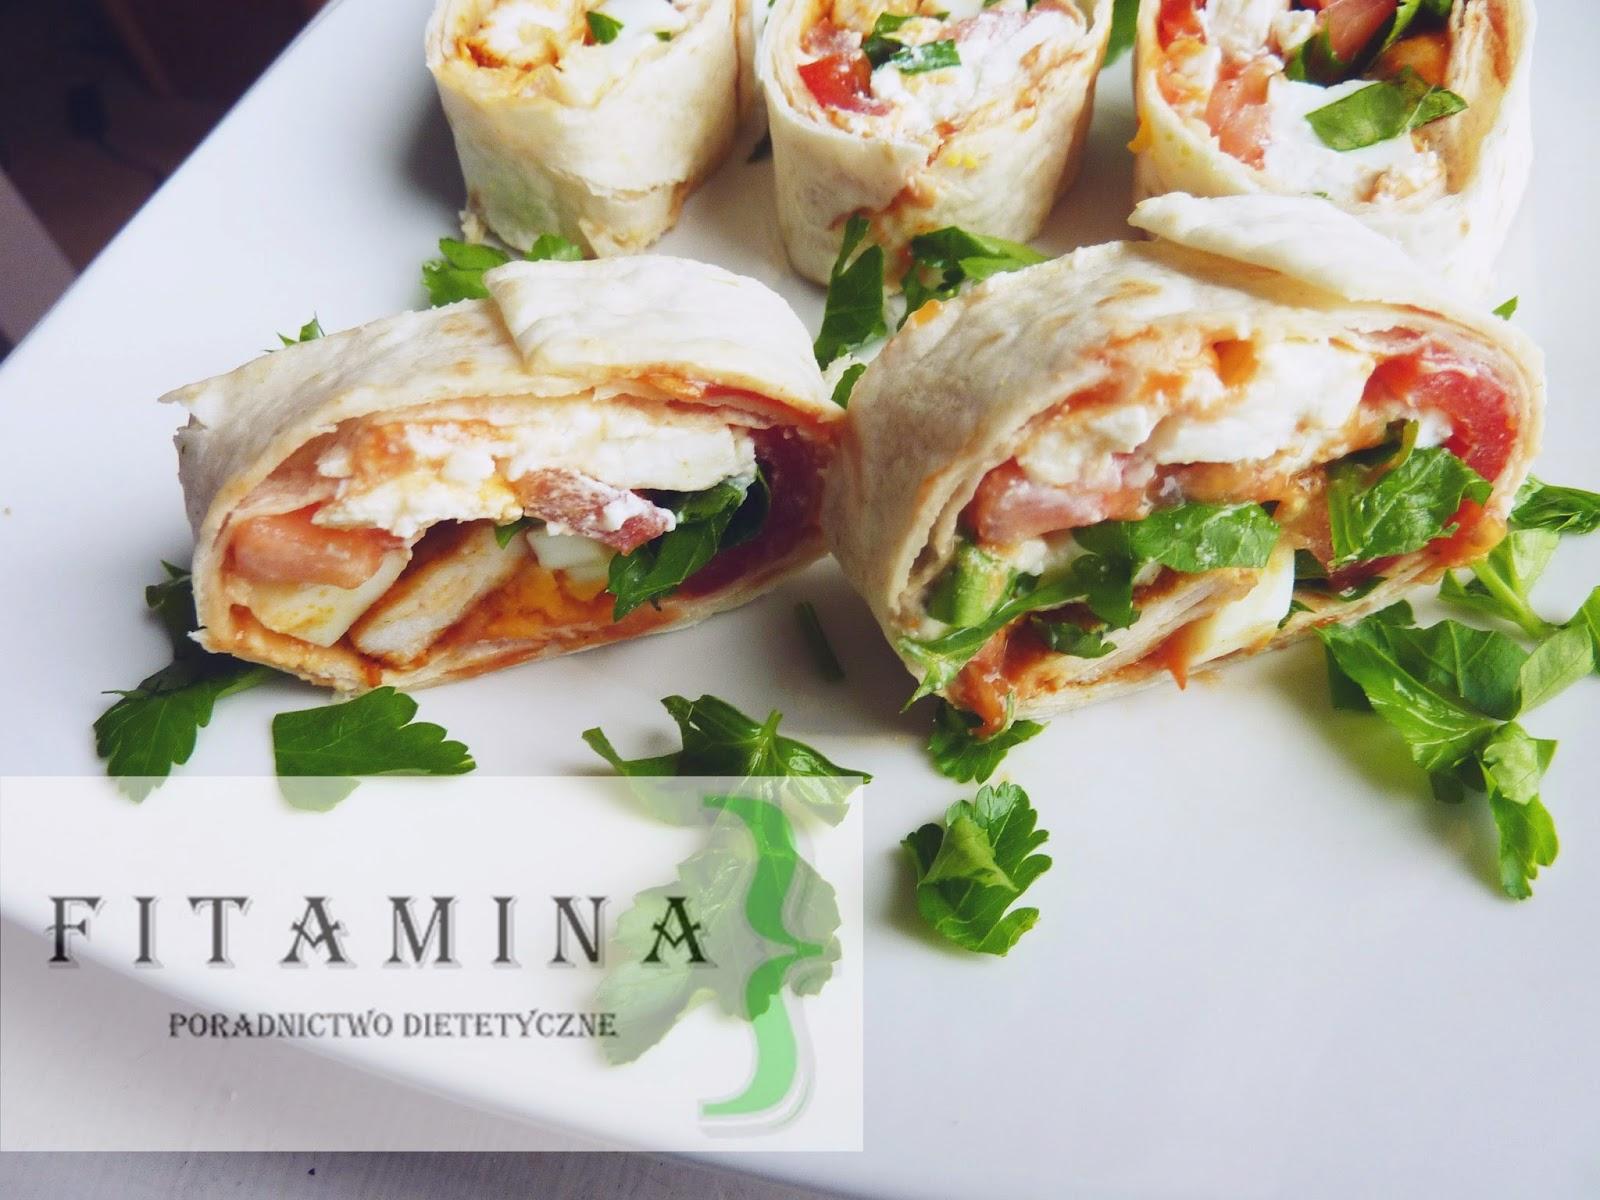 http://bonavita.pl/roladki-z-tortilli-pelnoziarnistej